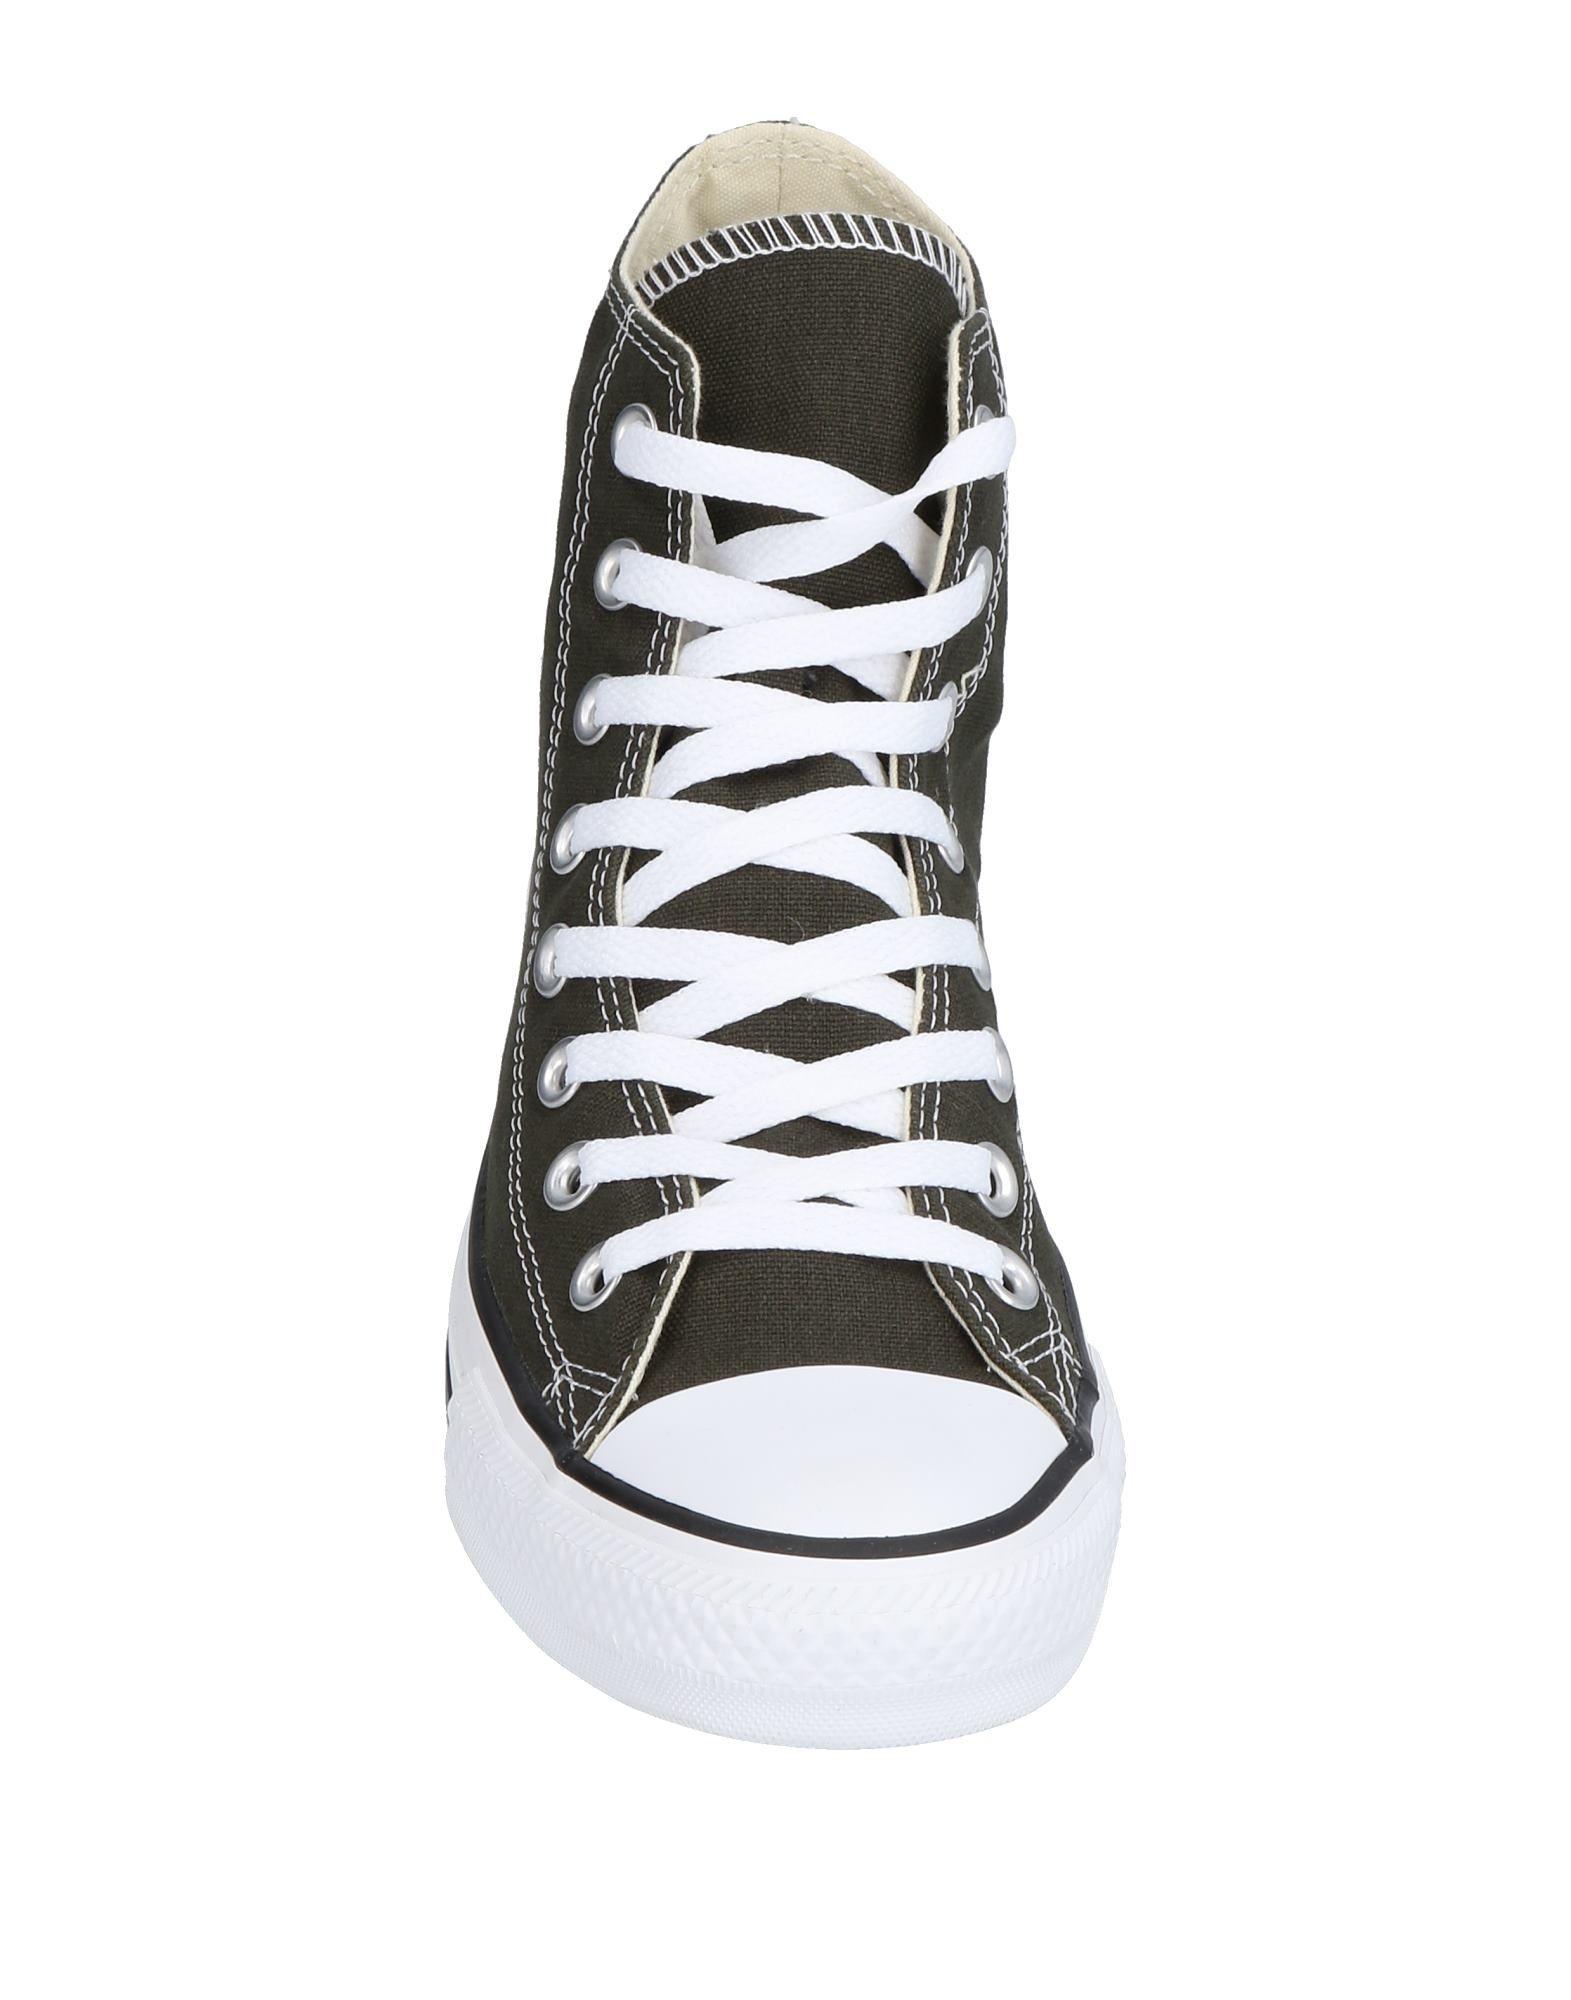 Rabatt echte Schuhe Herren Converse All Star Sneakers Herren Schuhe  11505574VF b4cc6d